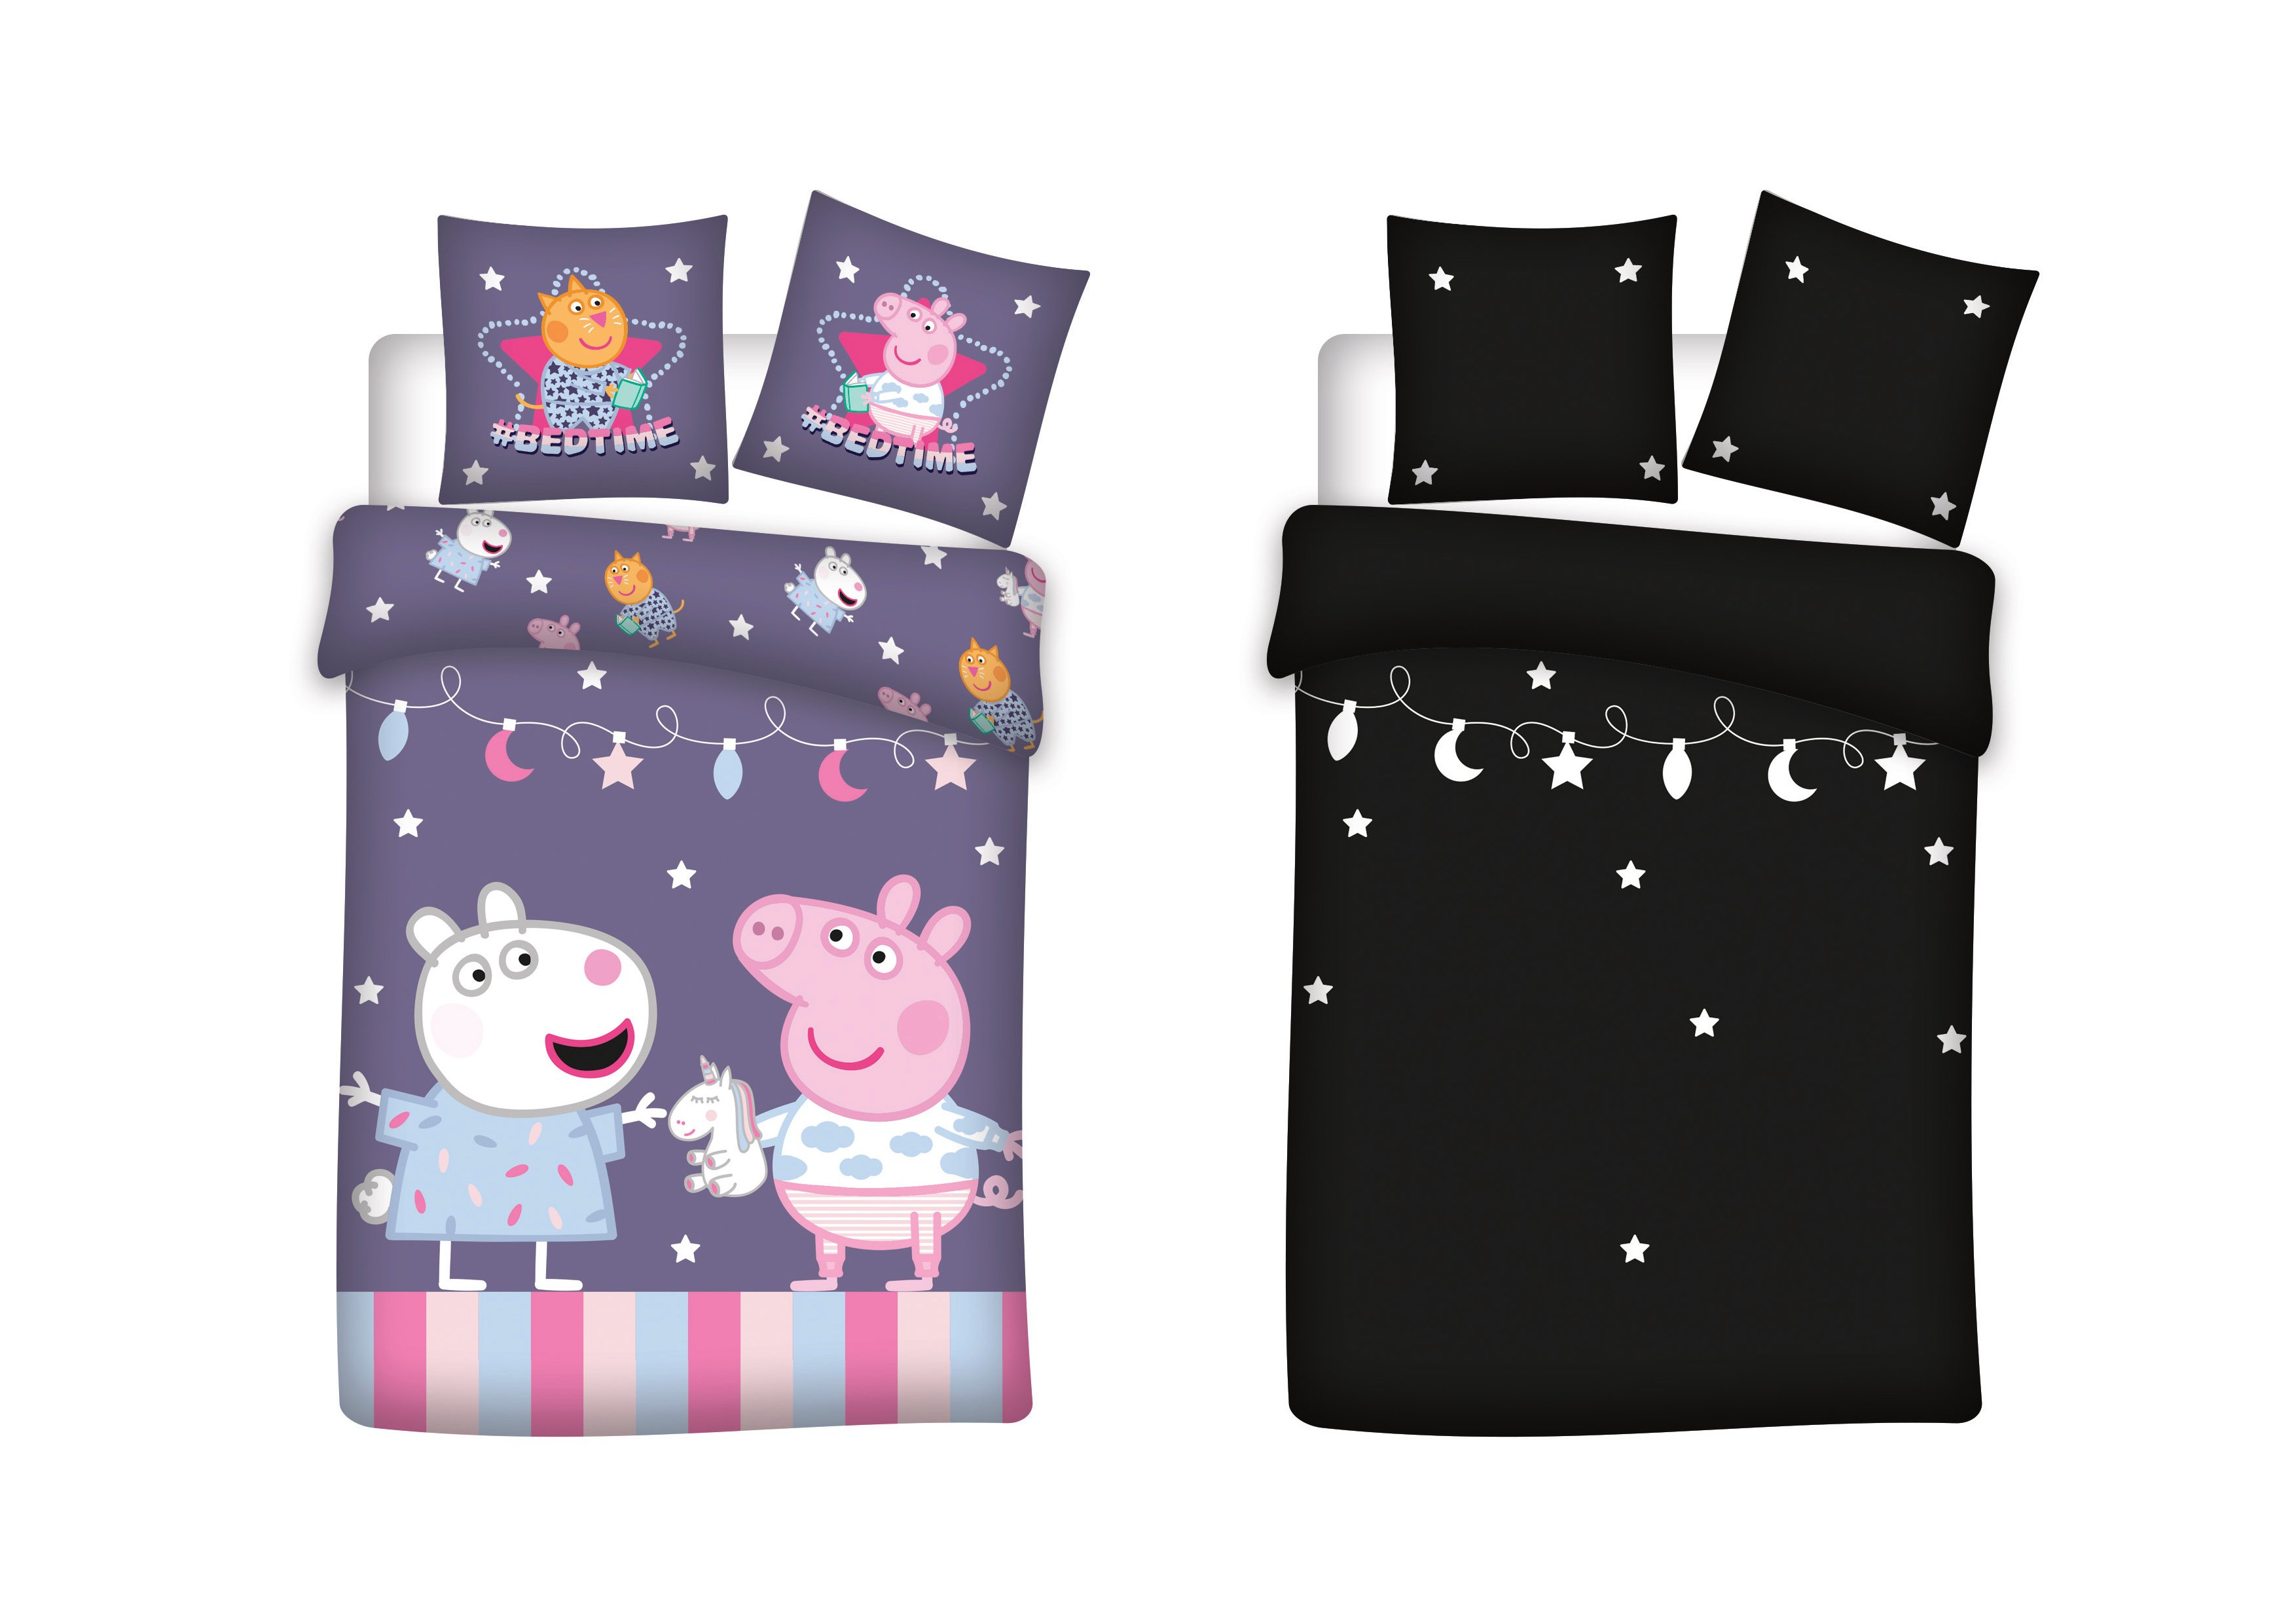 Bed Linen - Junior Size 100 x 140 cm - Glow in the dark - Peppa Pig (1000409)